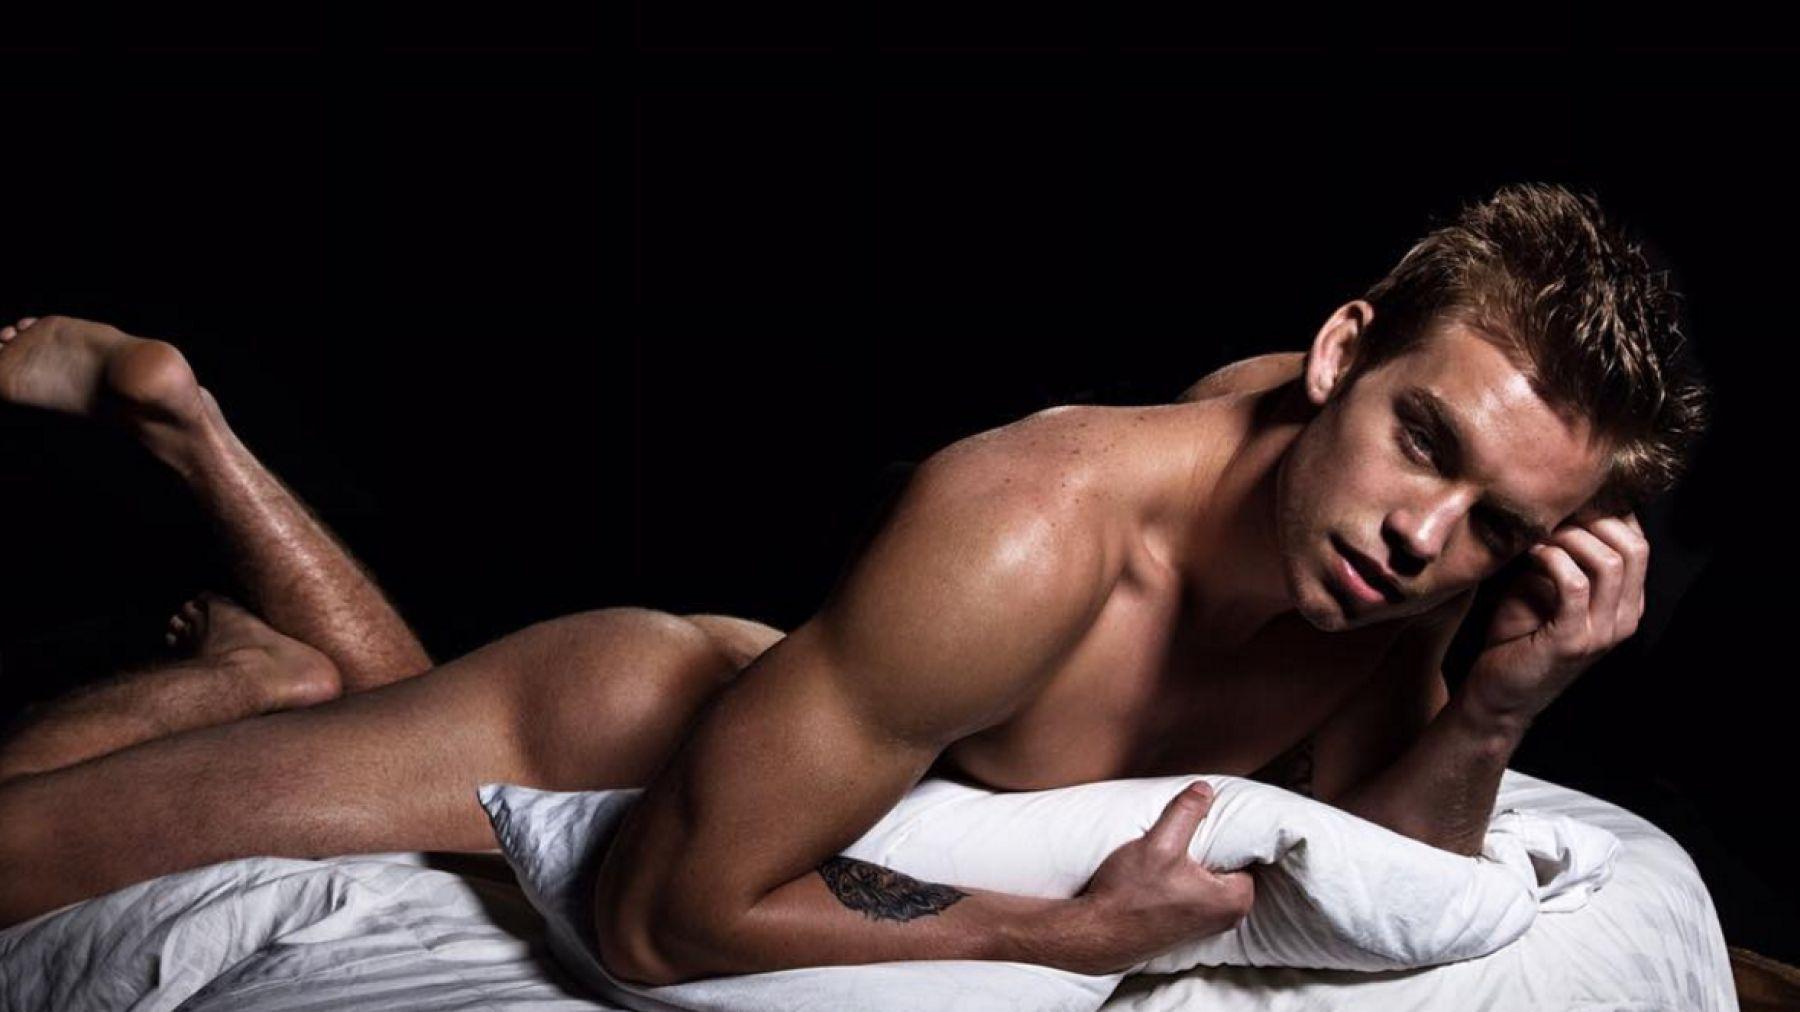 Naked america s next top model men